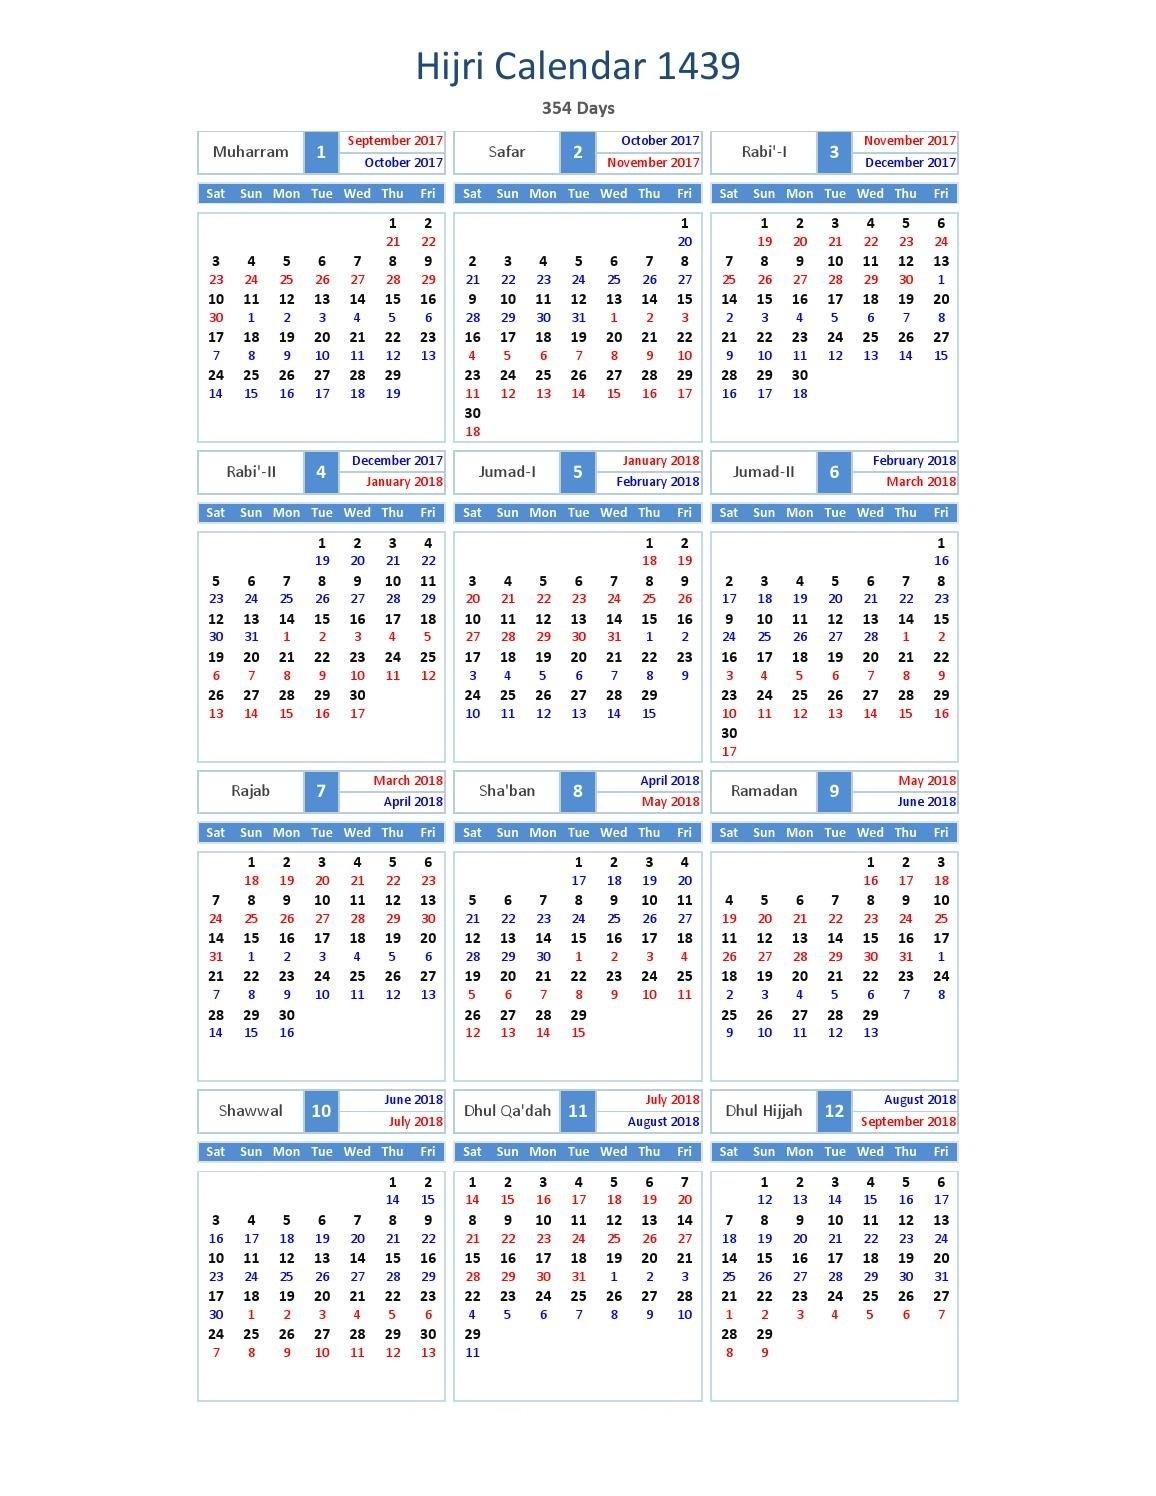 Islamic Calendar 2018 | Hijri Calendar 1439 | Free Printable intended for Islamic Calander Template Lunar Cycle